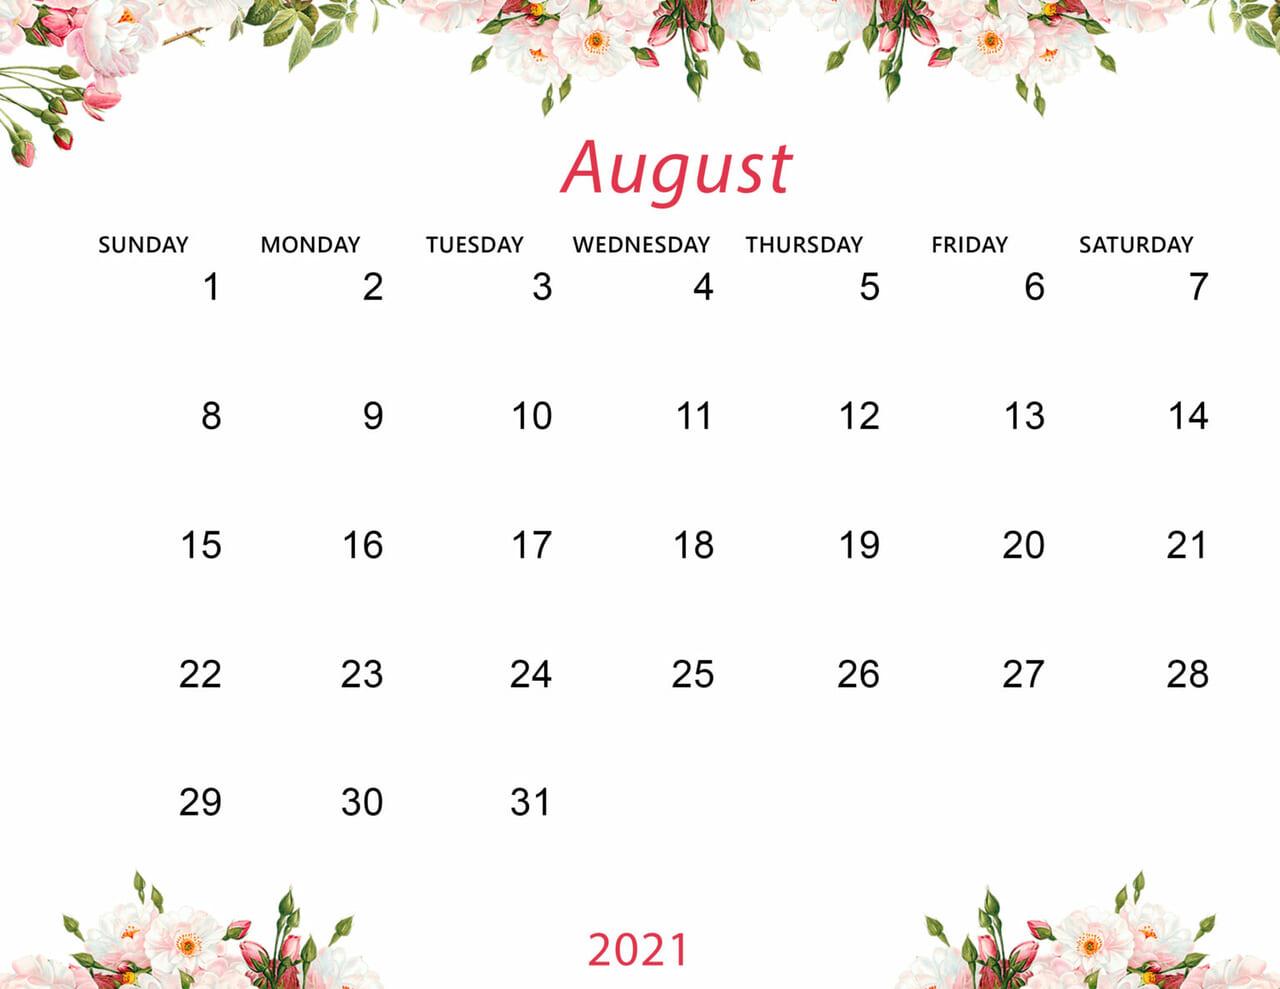 Cute August 2021 Calendar Desktop Wallpaper on We Heart It 1280x989